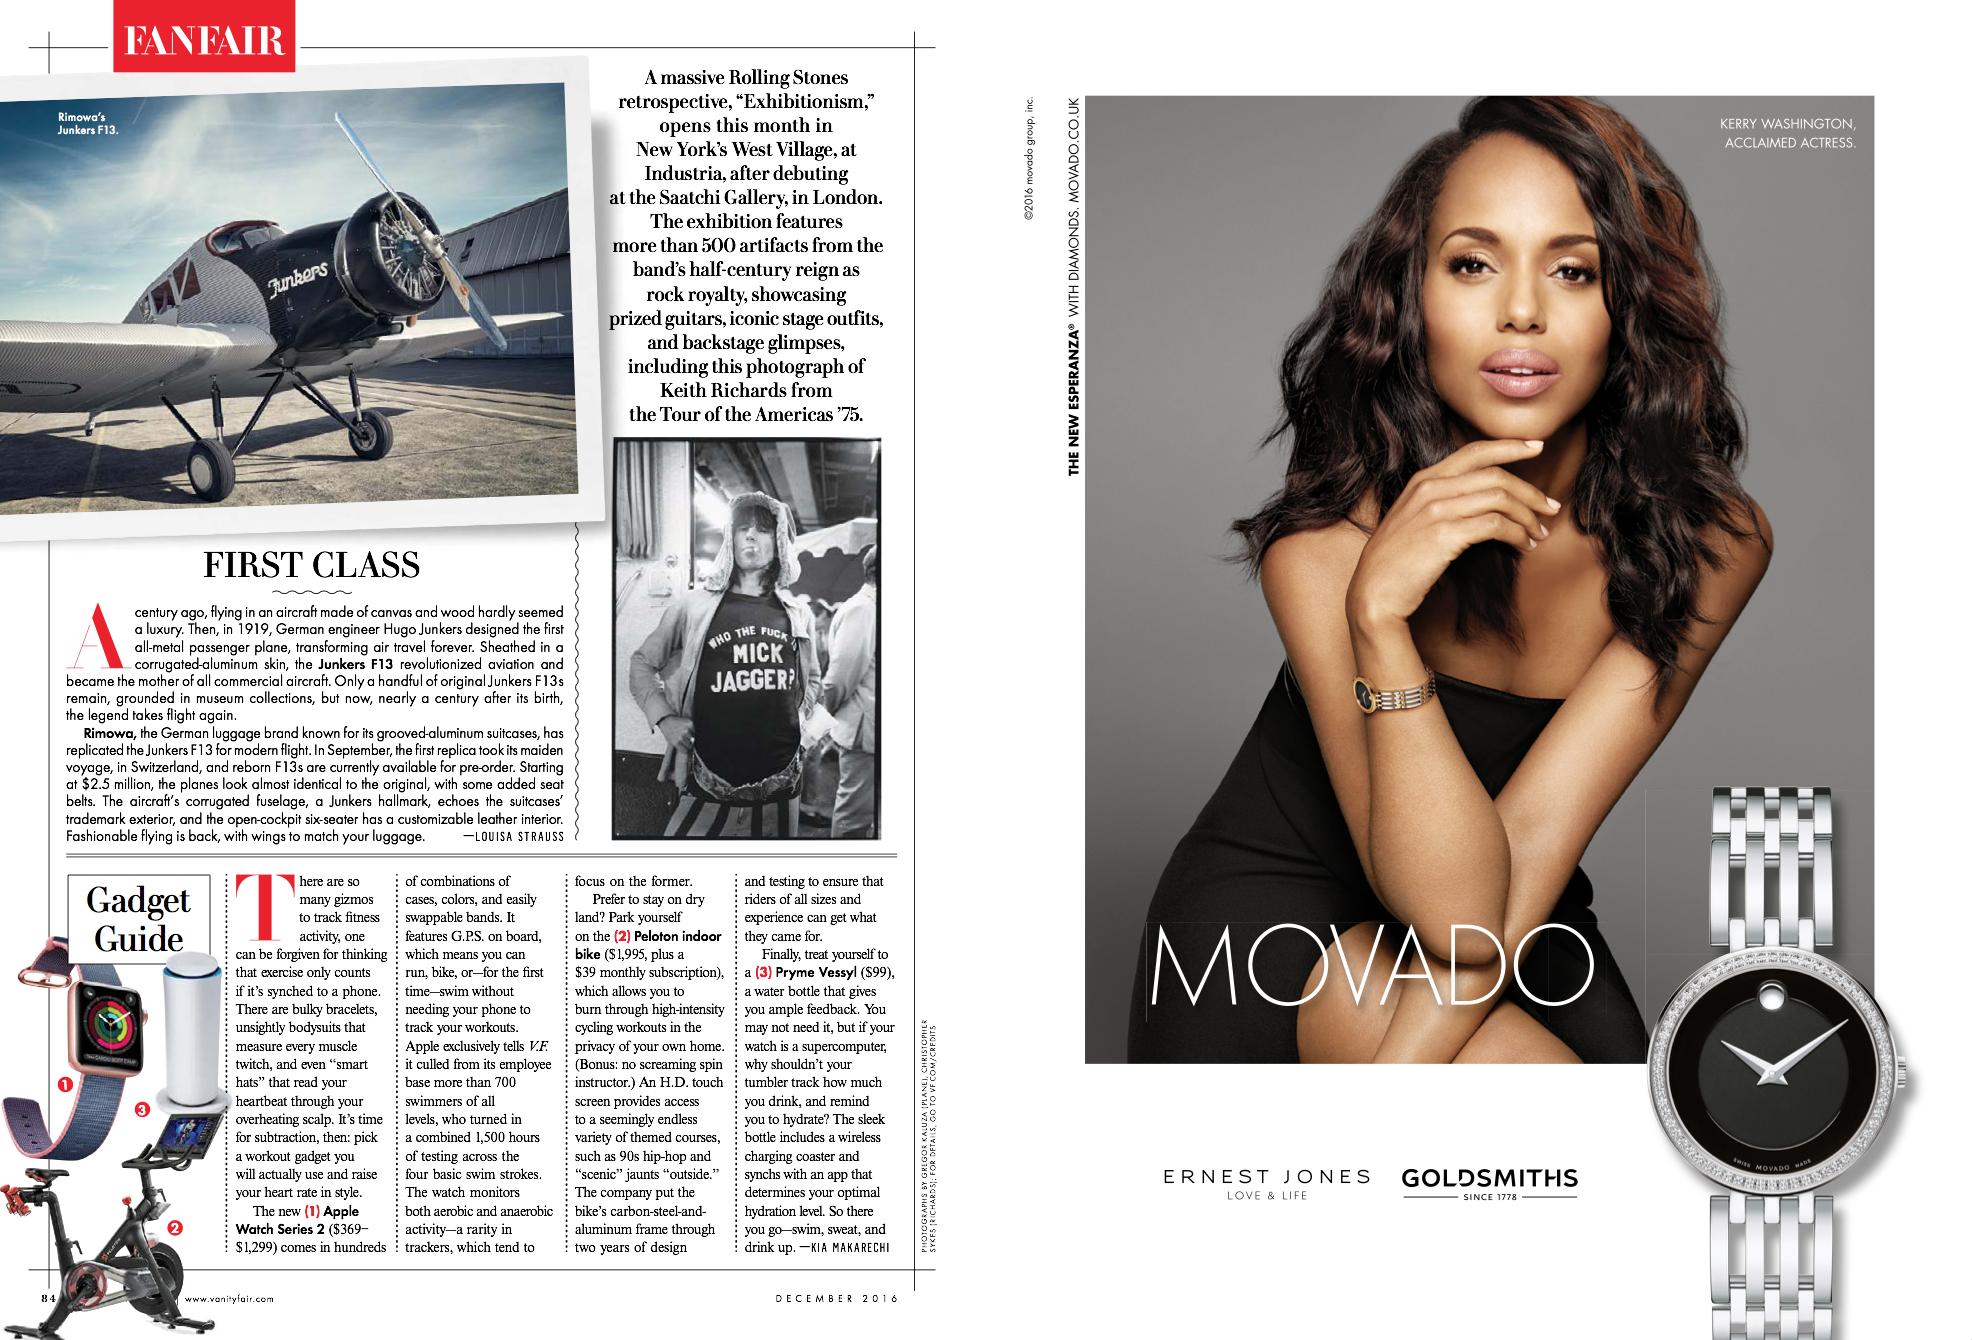 Magazines for Movado